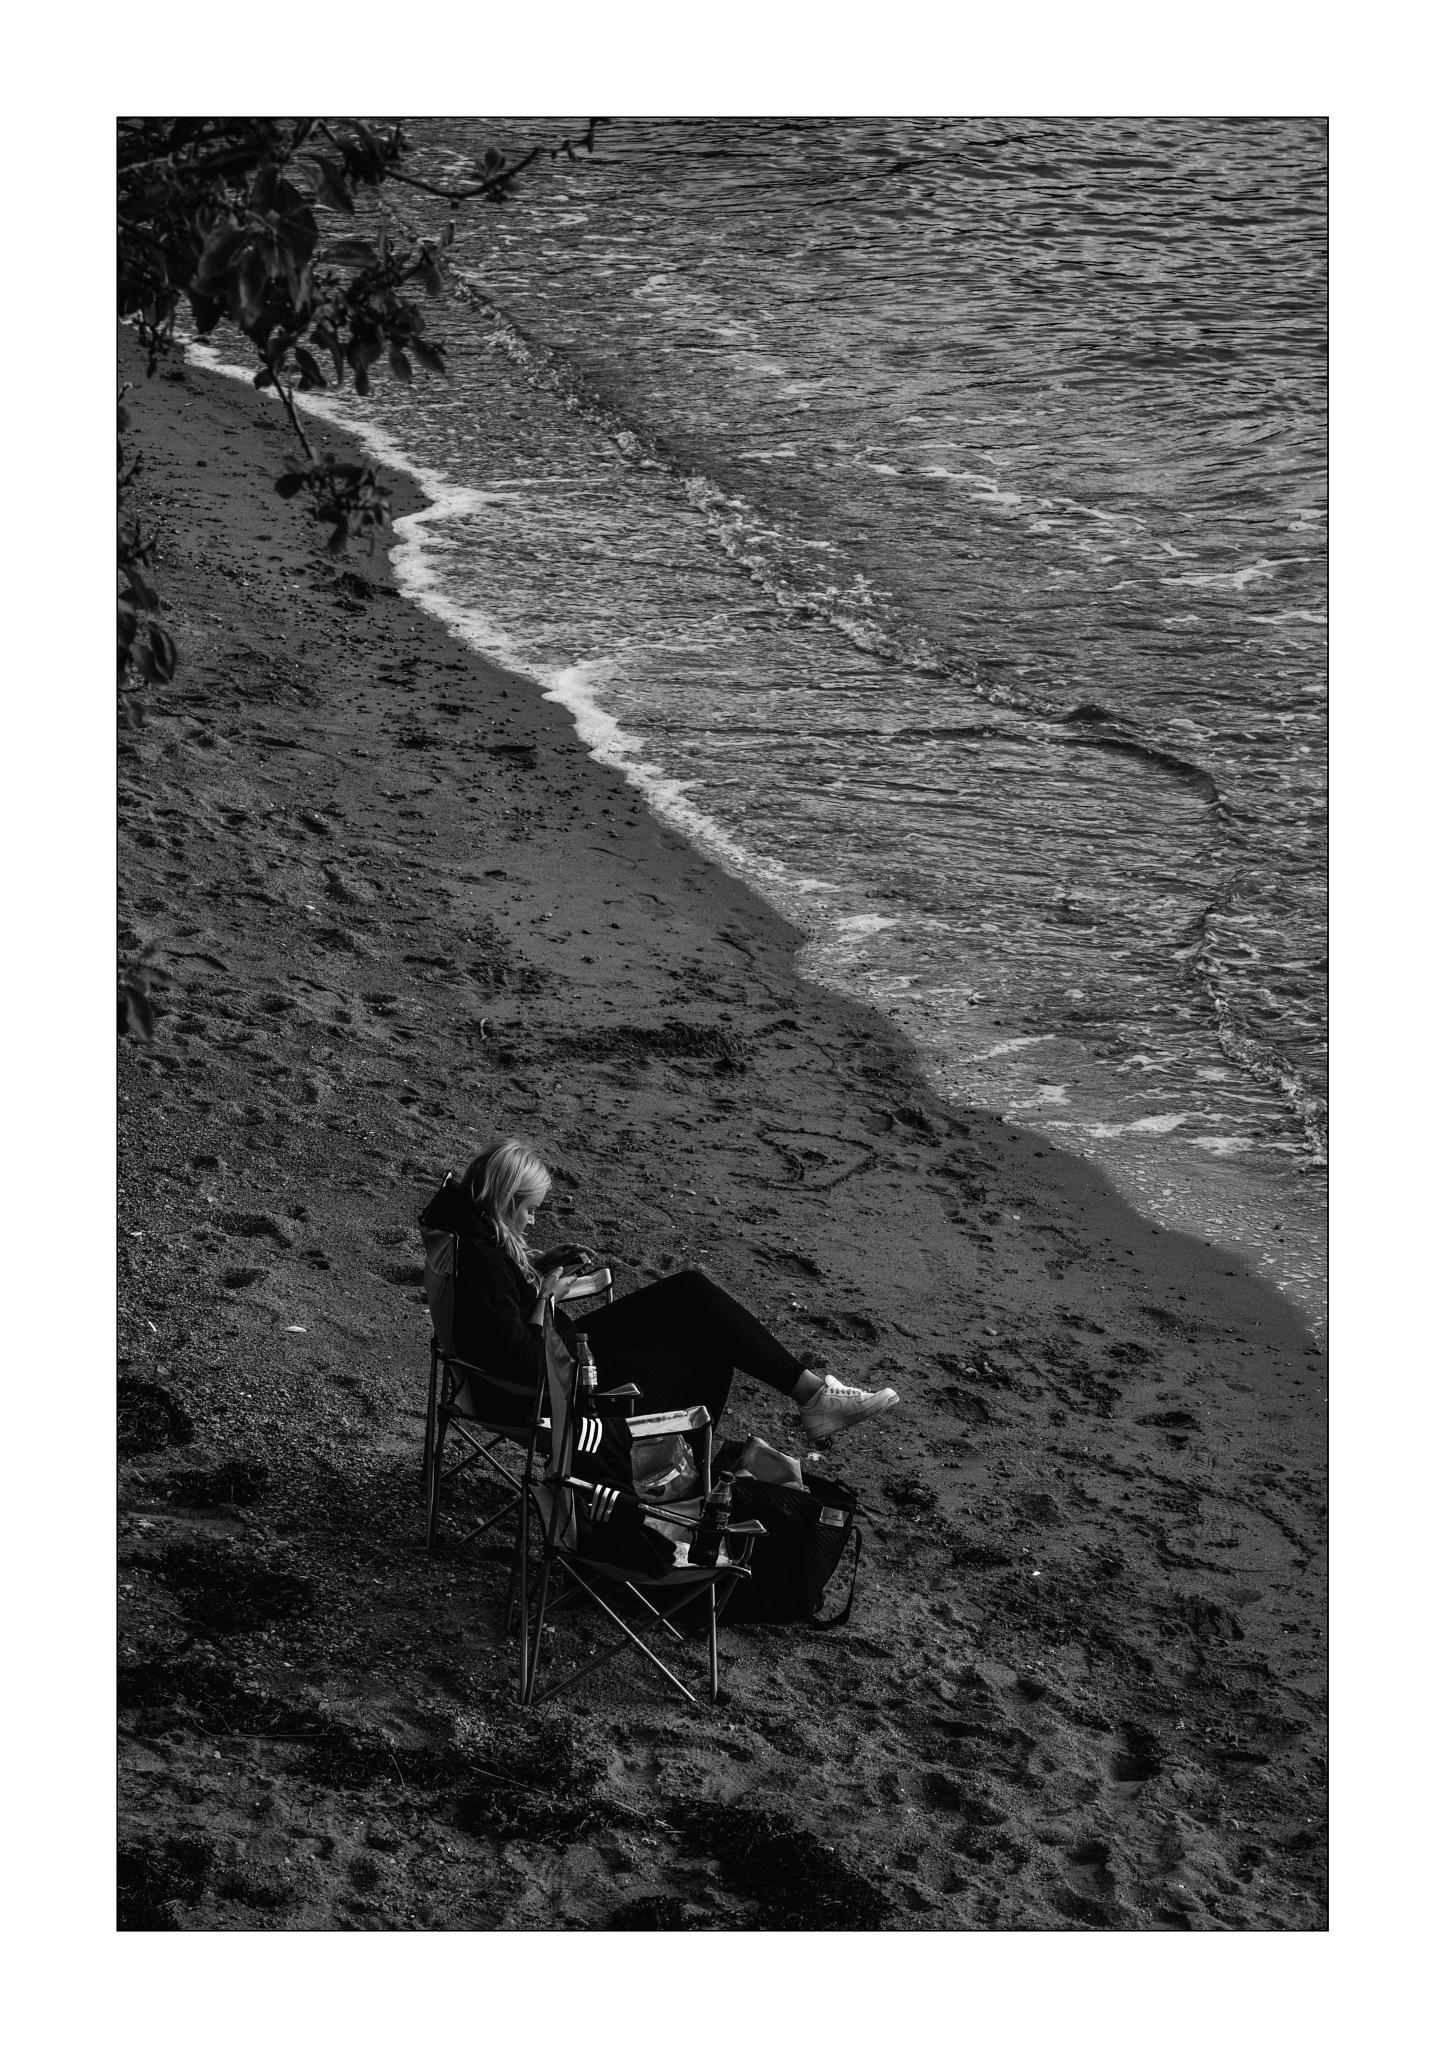 Summer on  The Northern Beach by Goran Jorganovich